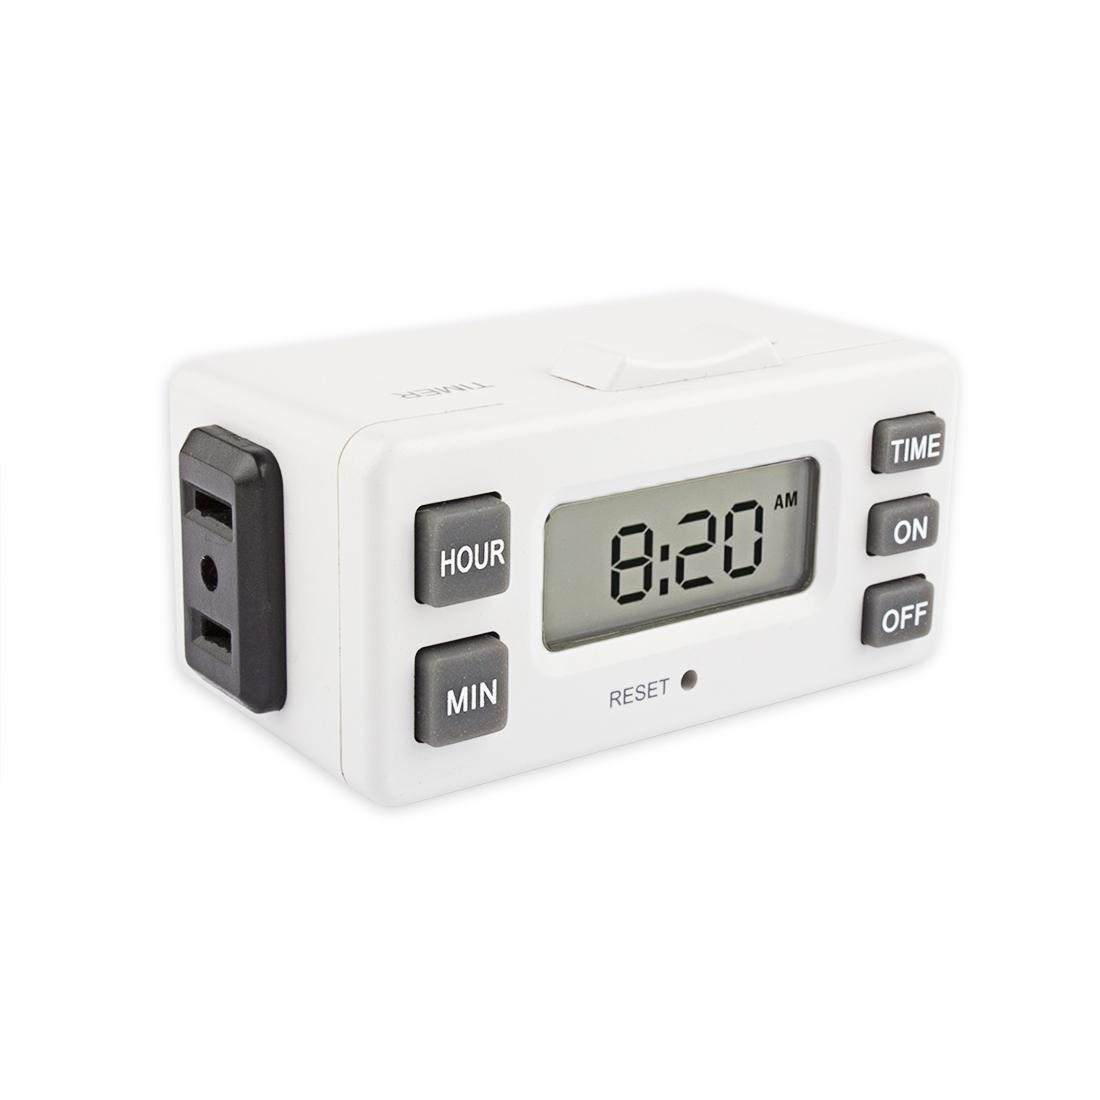 TM224 1-Outlet Daily Programme Digital Bar Timer Indoor TimerMax Digislim Polarized